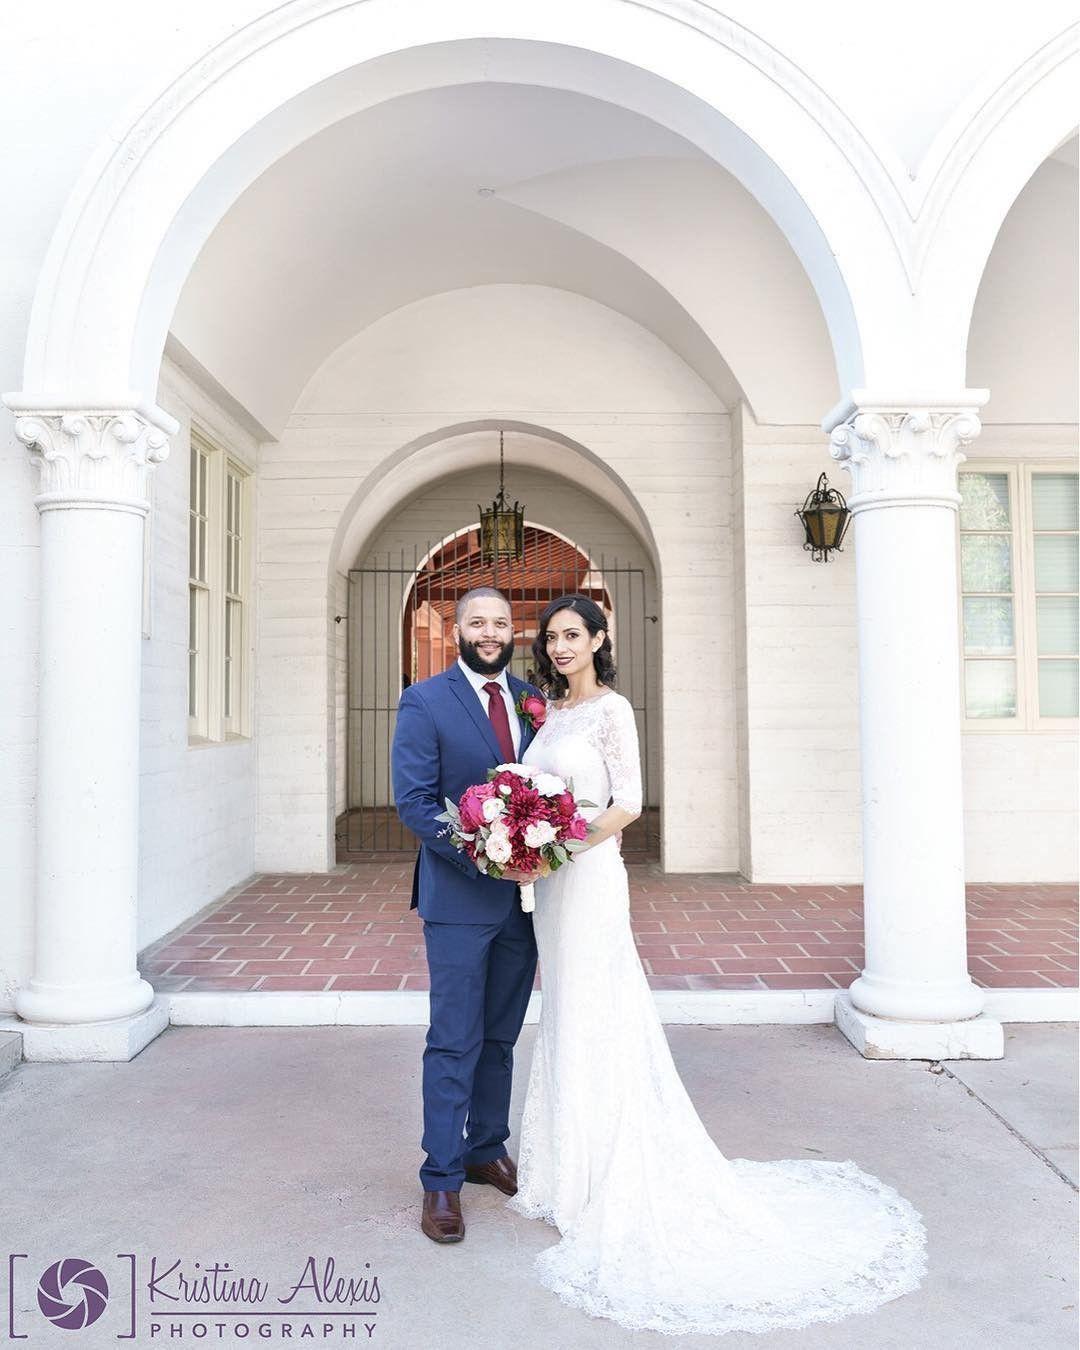 Pin On Life Weddings